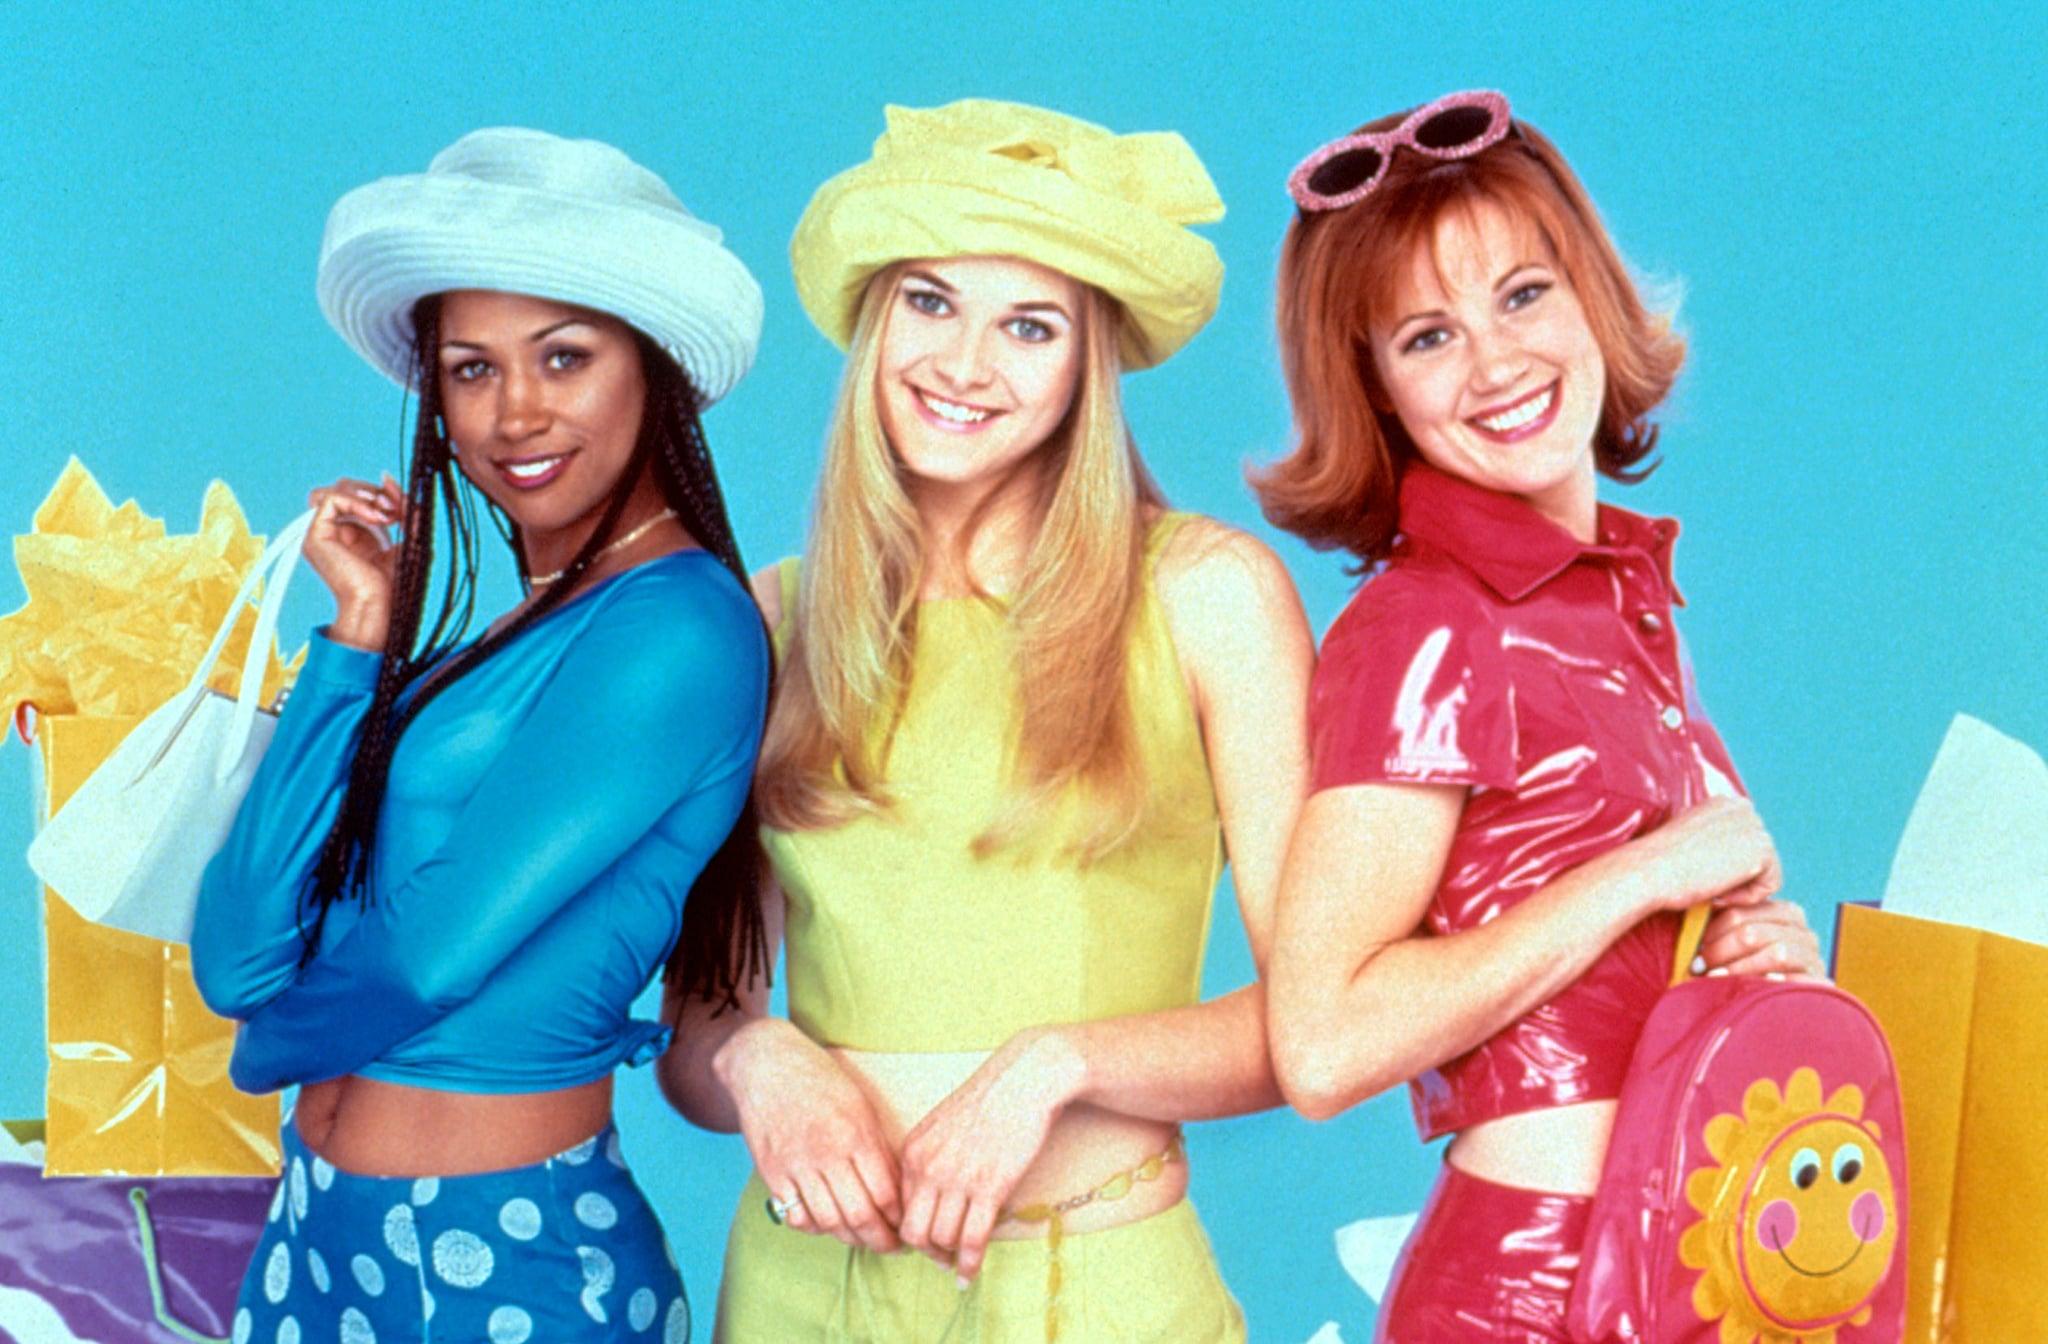 CLUELESS, Stacey Dash, Rachel Blanchard, Elisa Donovan, 1996-99,  Paramount / Courtesy: Everett Collection